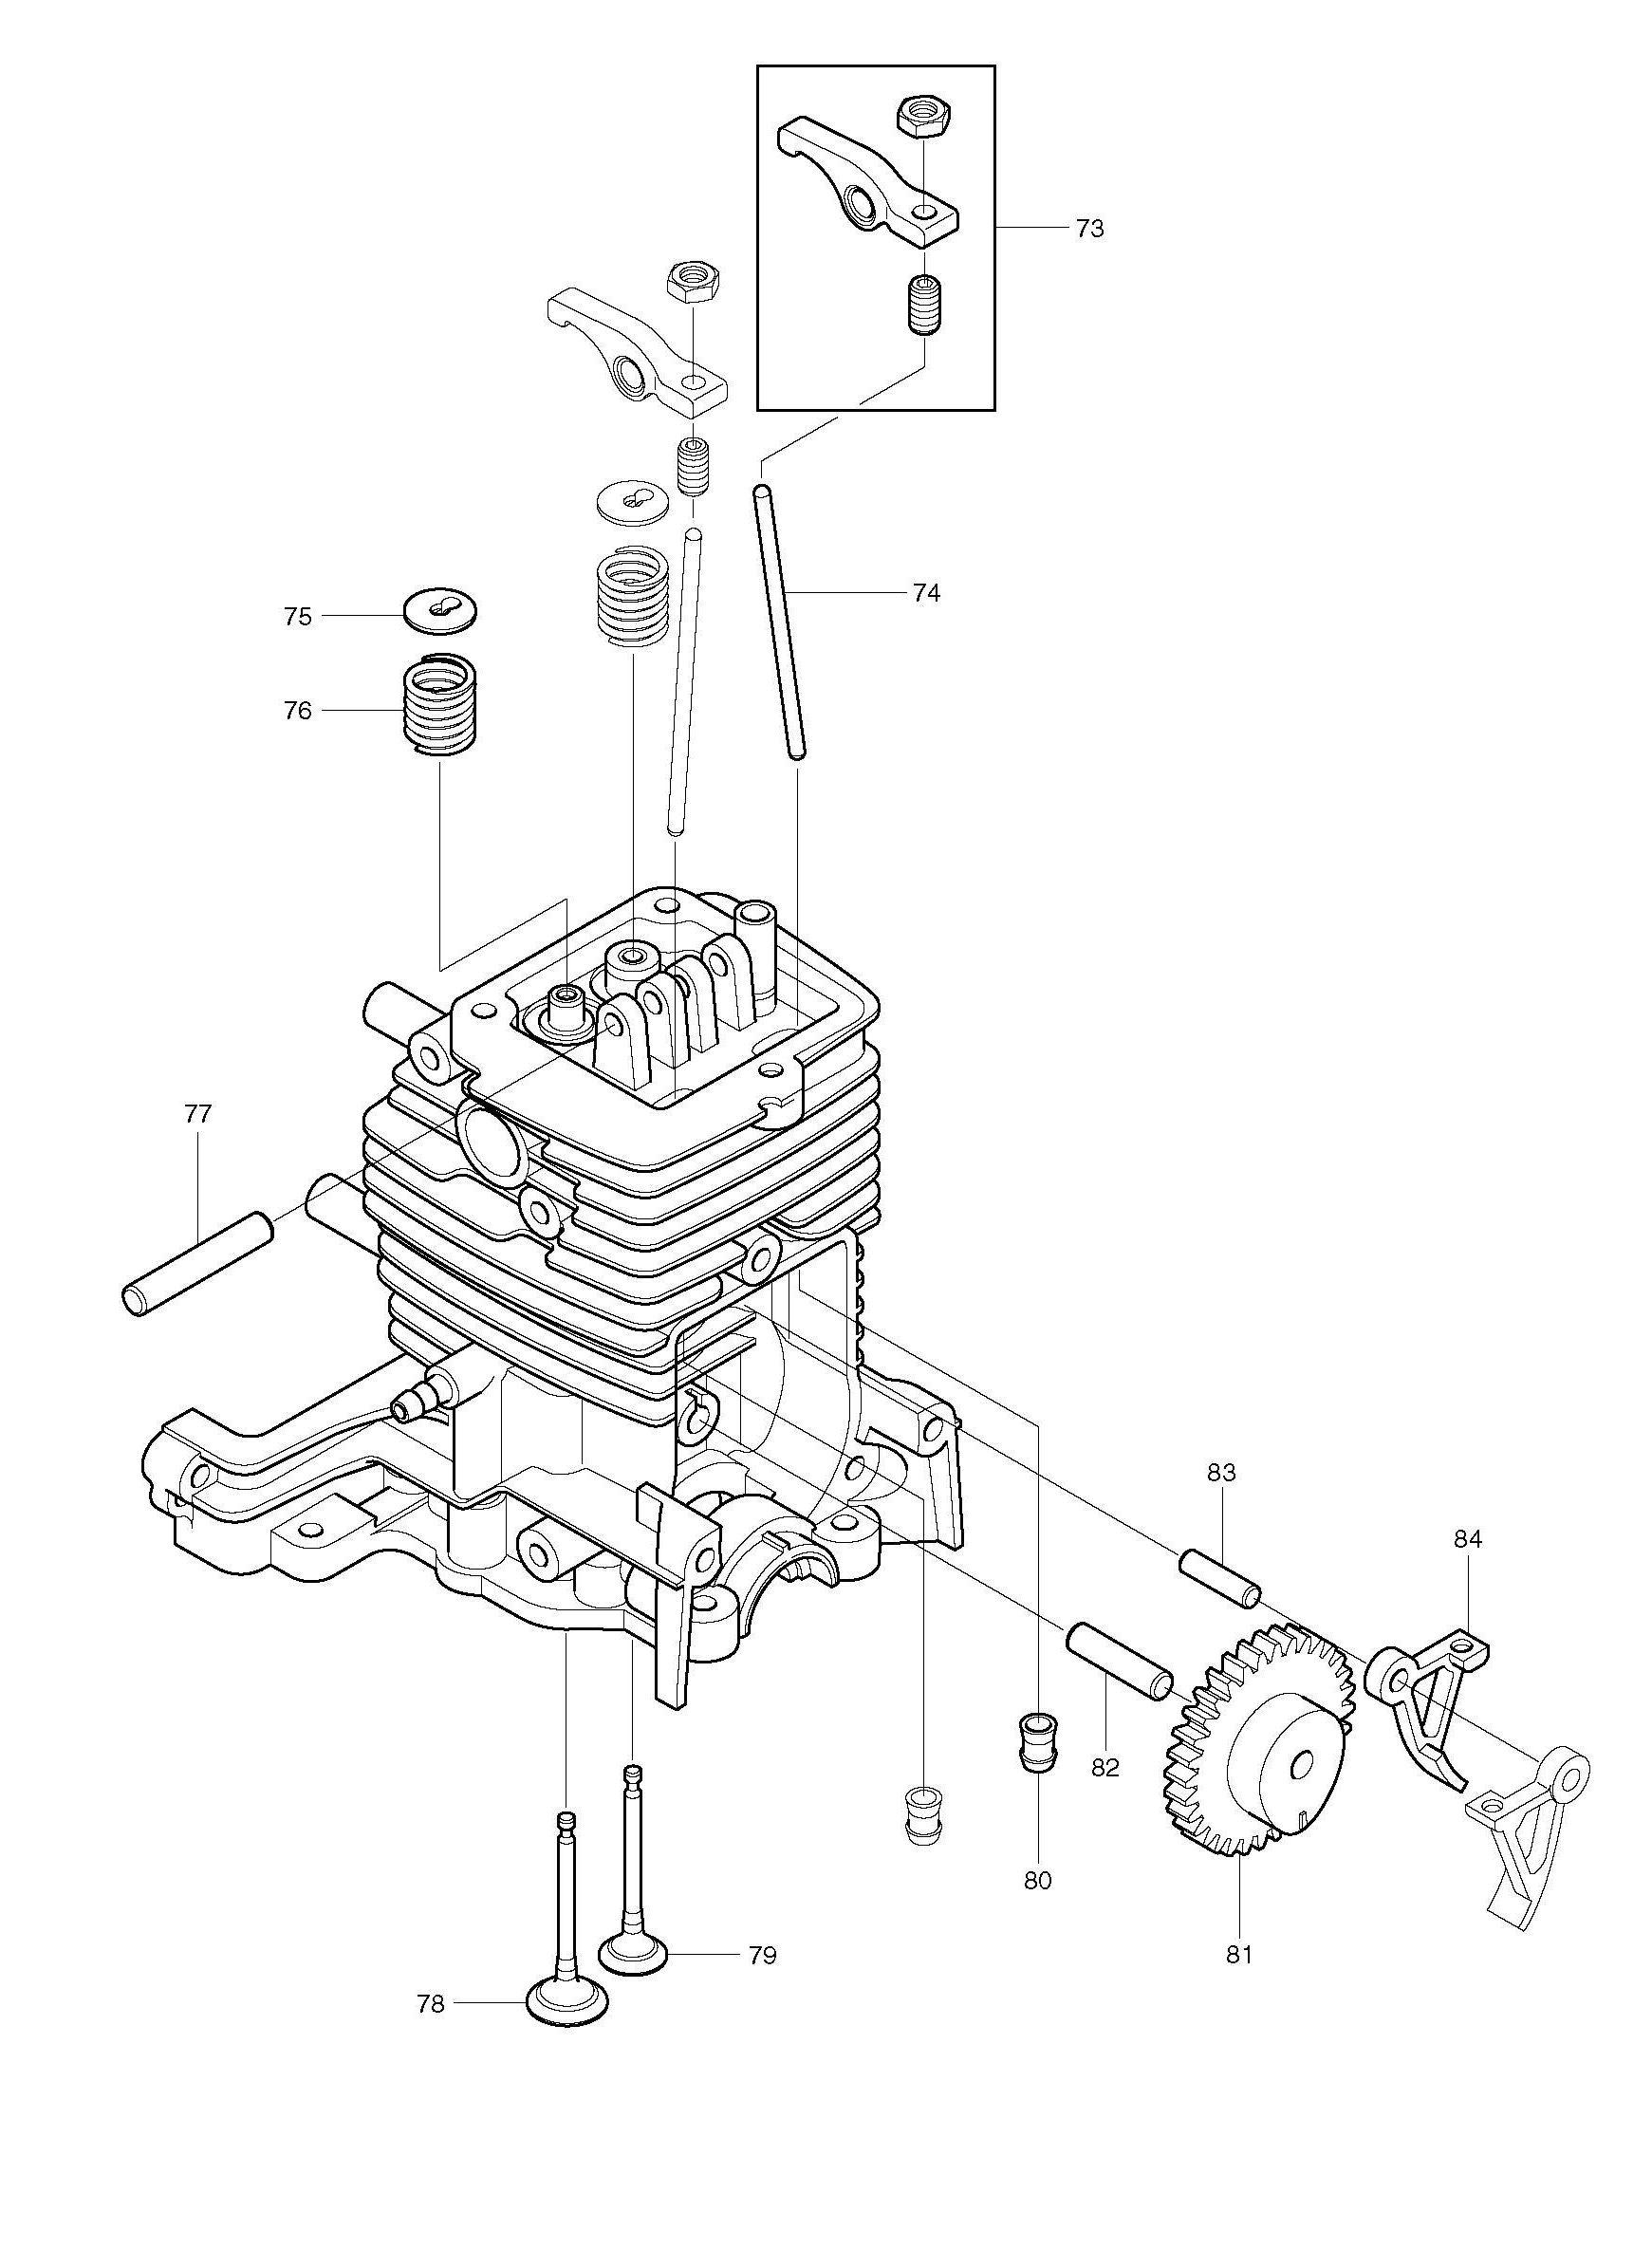 hight resolution of makita blower wiring diagram wiring diagrams schema blower air cleaner makita blower wiring diagram